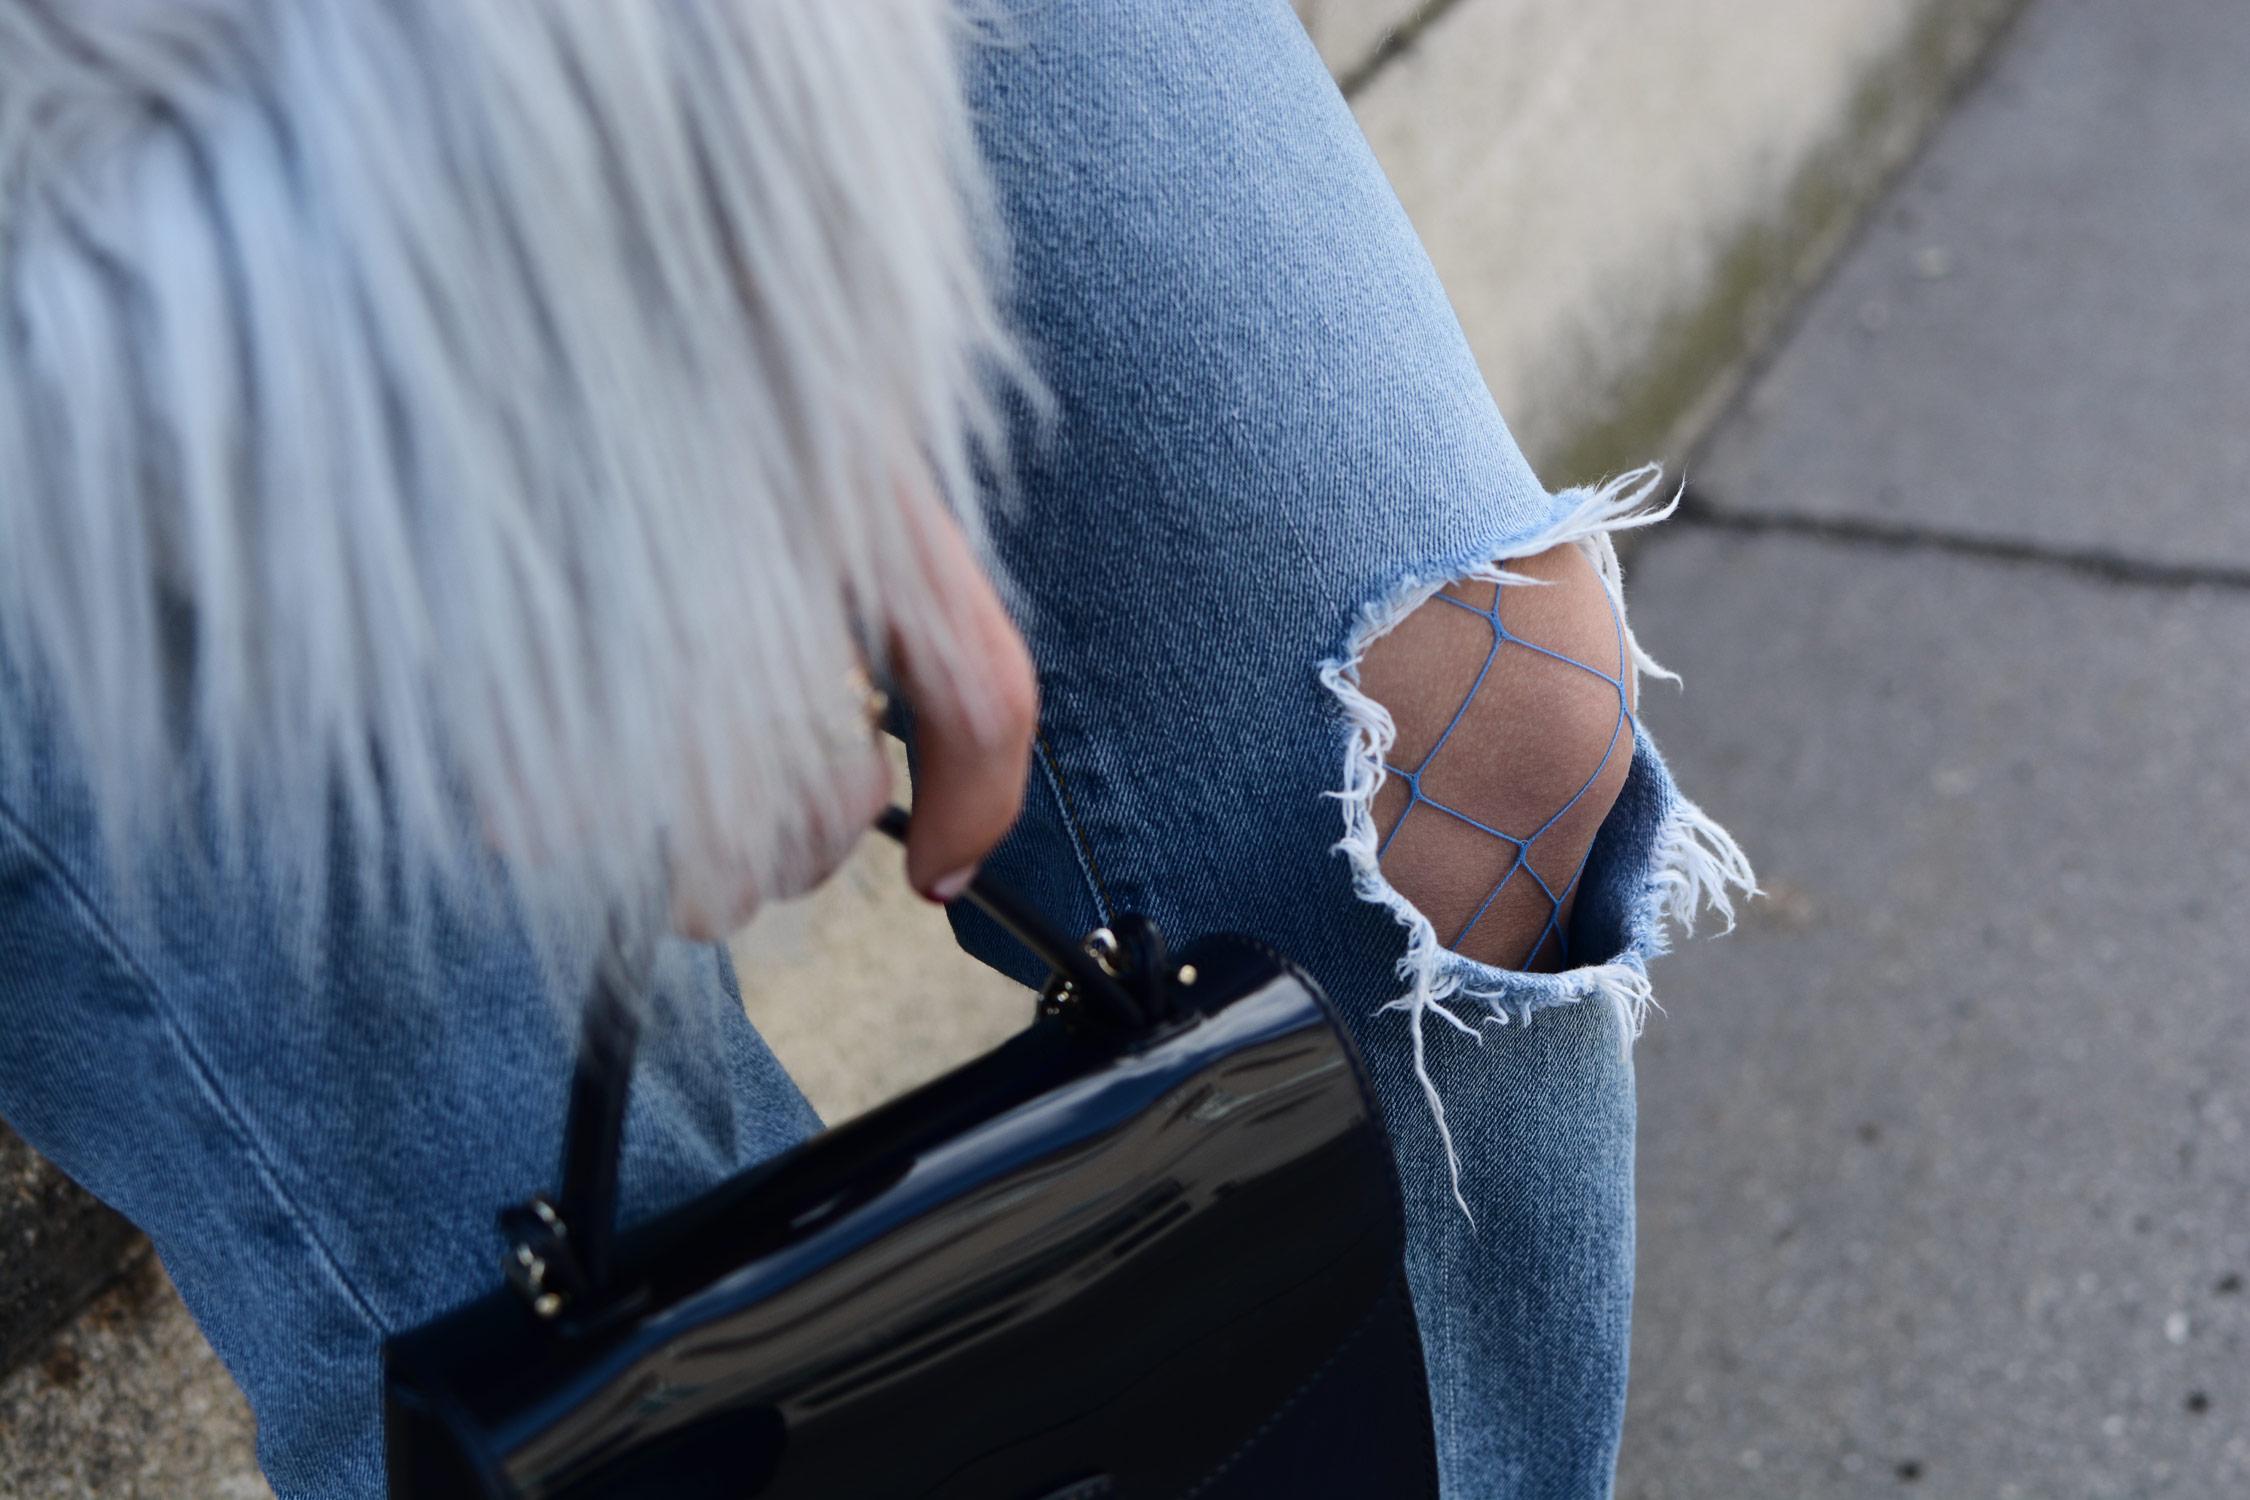 Volant Trend 2017, Trends Frühling Sommer, fake für janke, furla Tasche, falke netzstrumpfhose, destroyed jeans